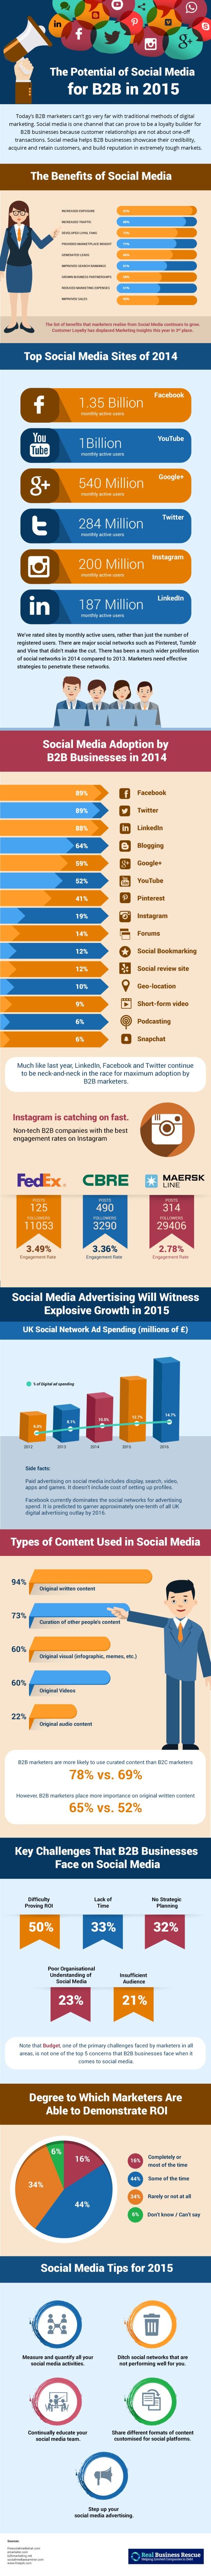 social media use trend 2015 business